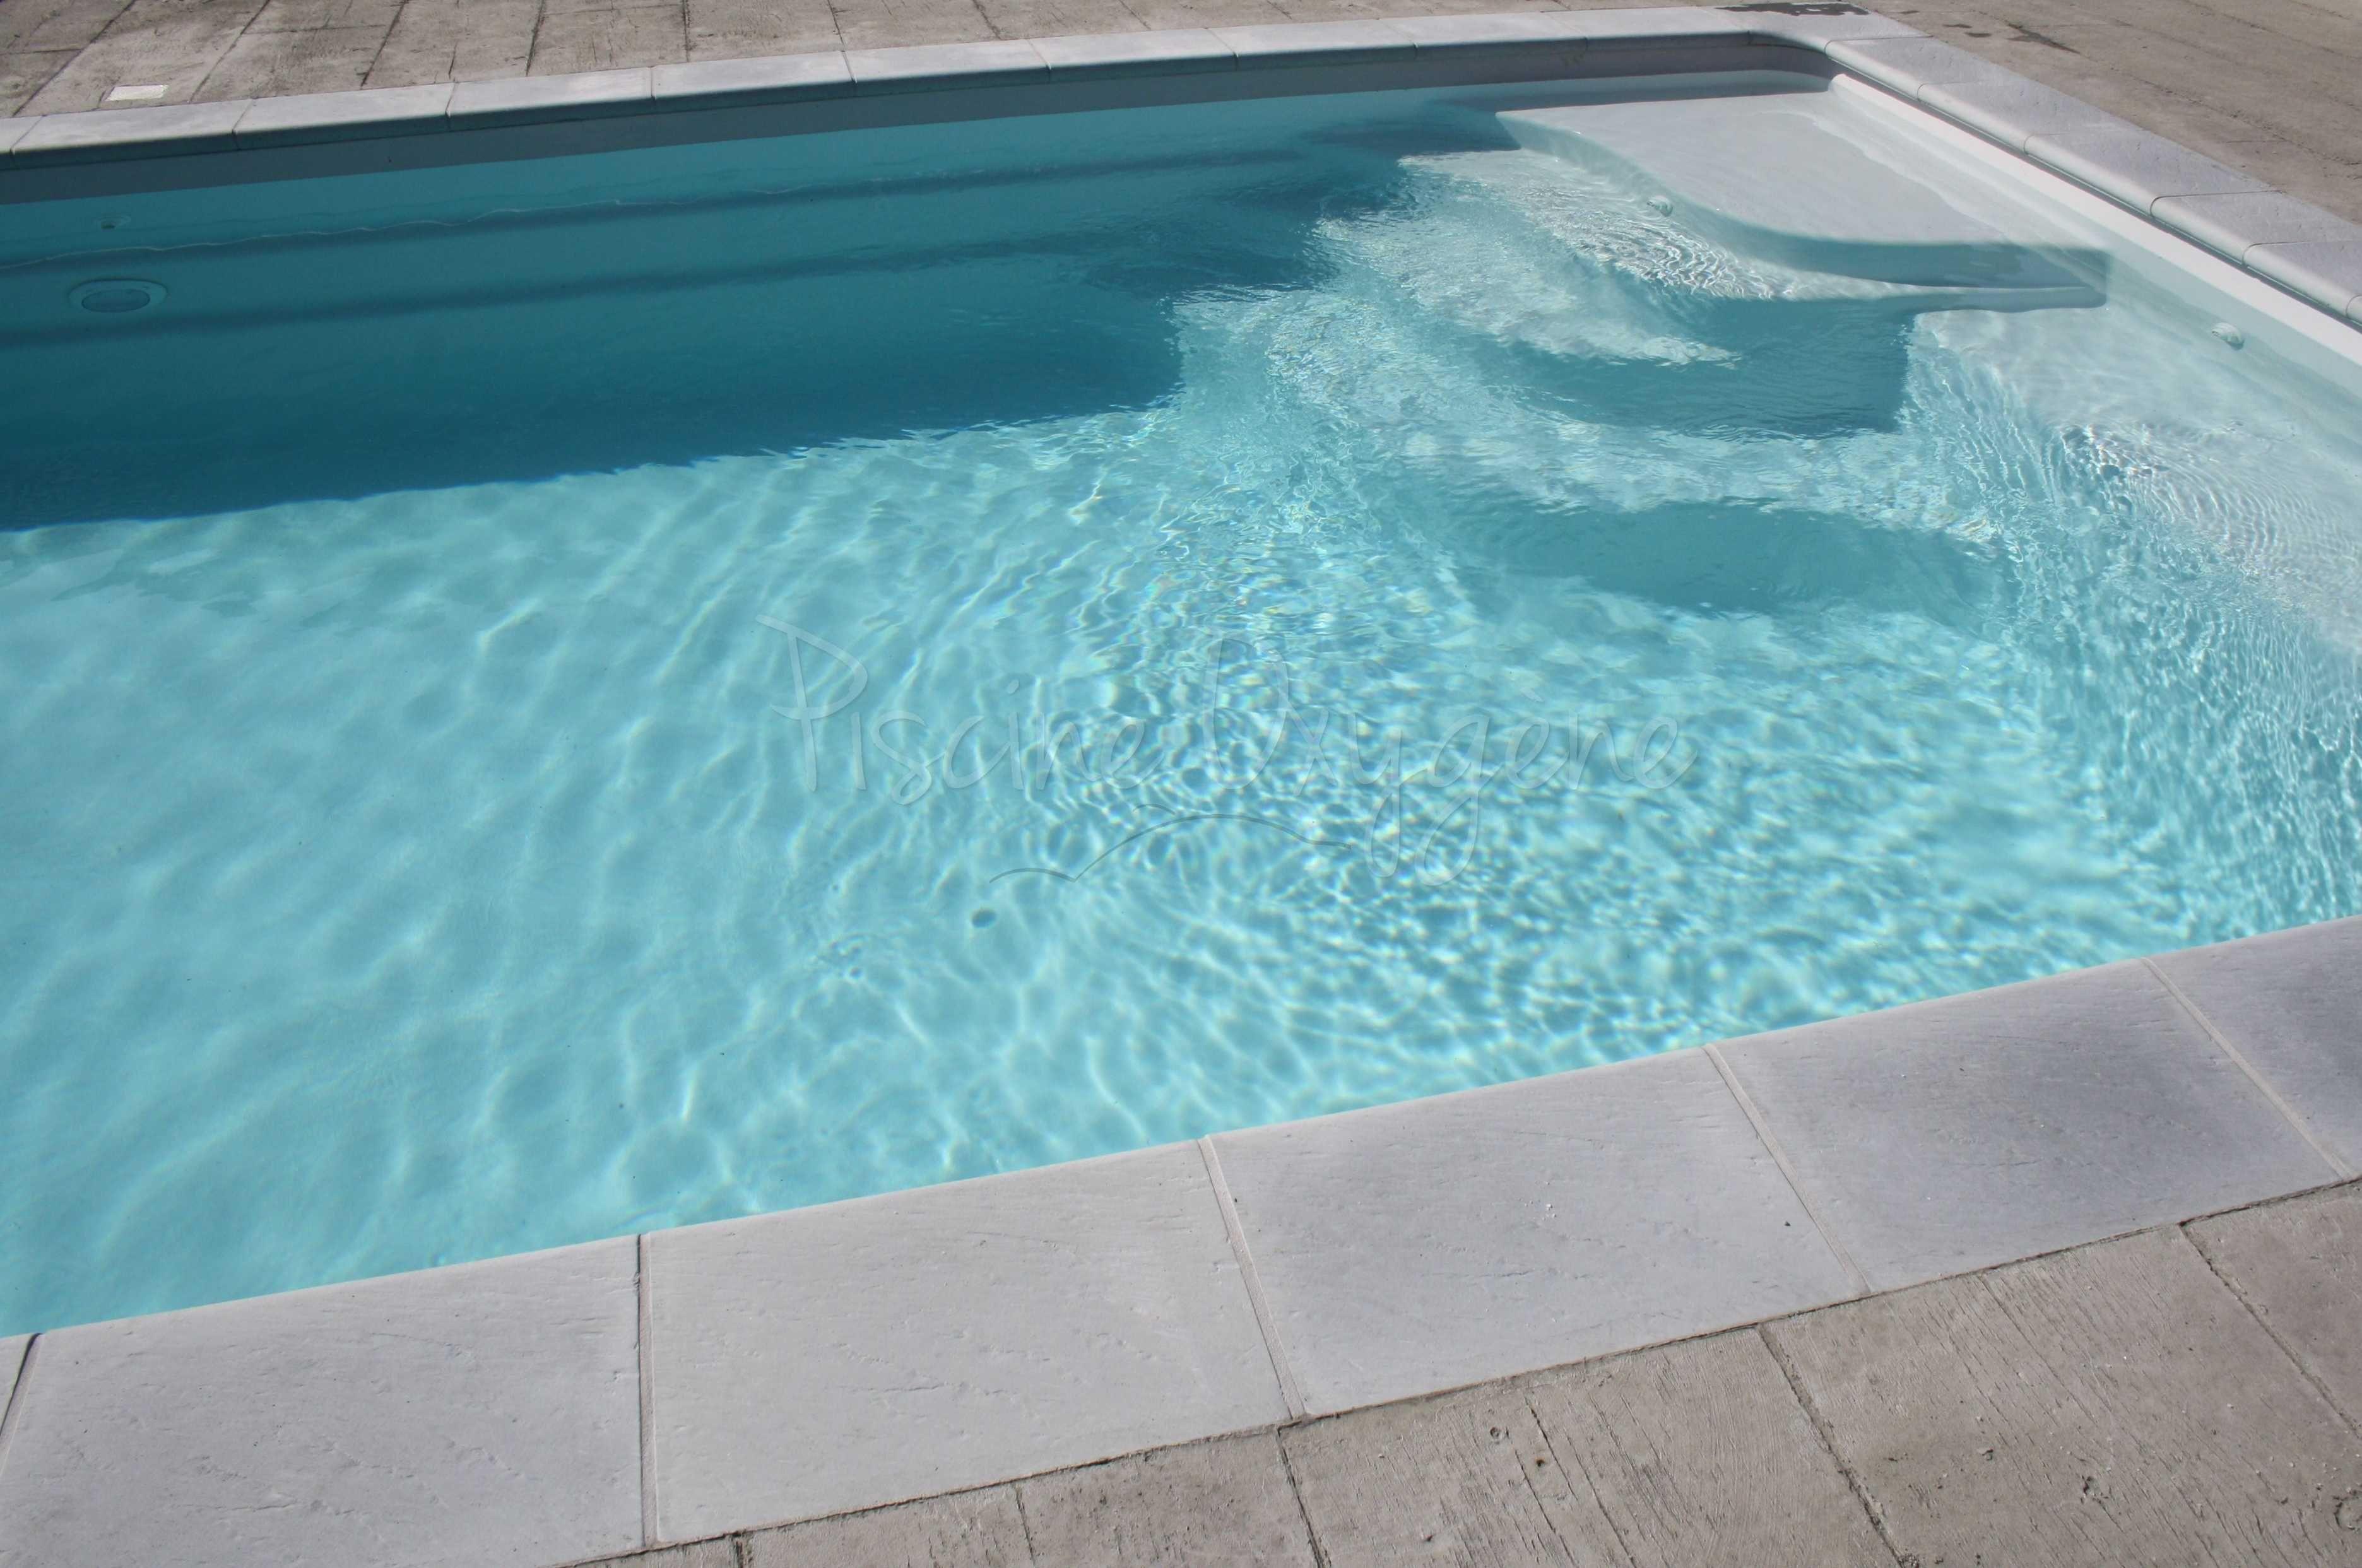 epingle sur piscine coque unique mdp